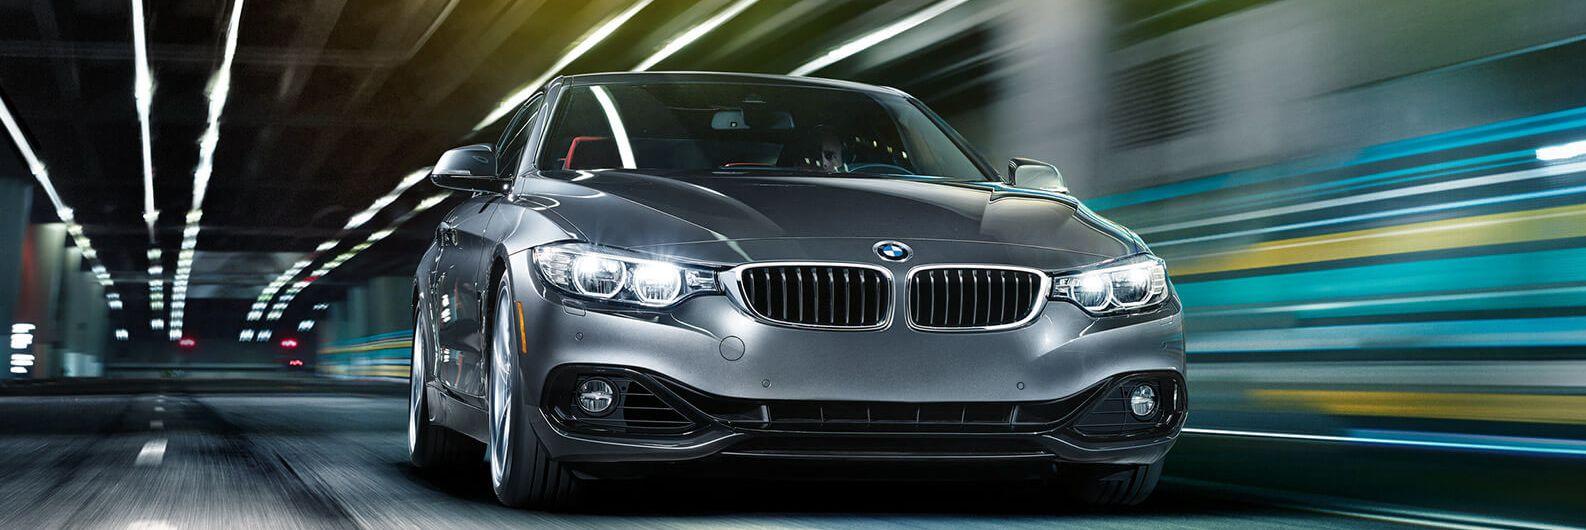 coupe in ca gran bmw for ana sedan santa series sale new